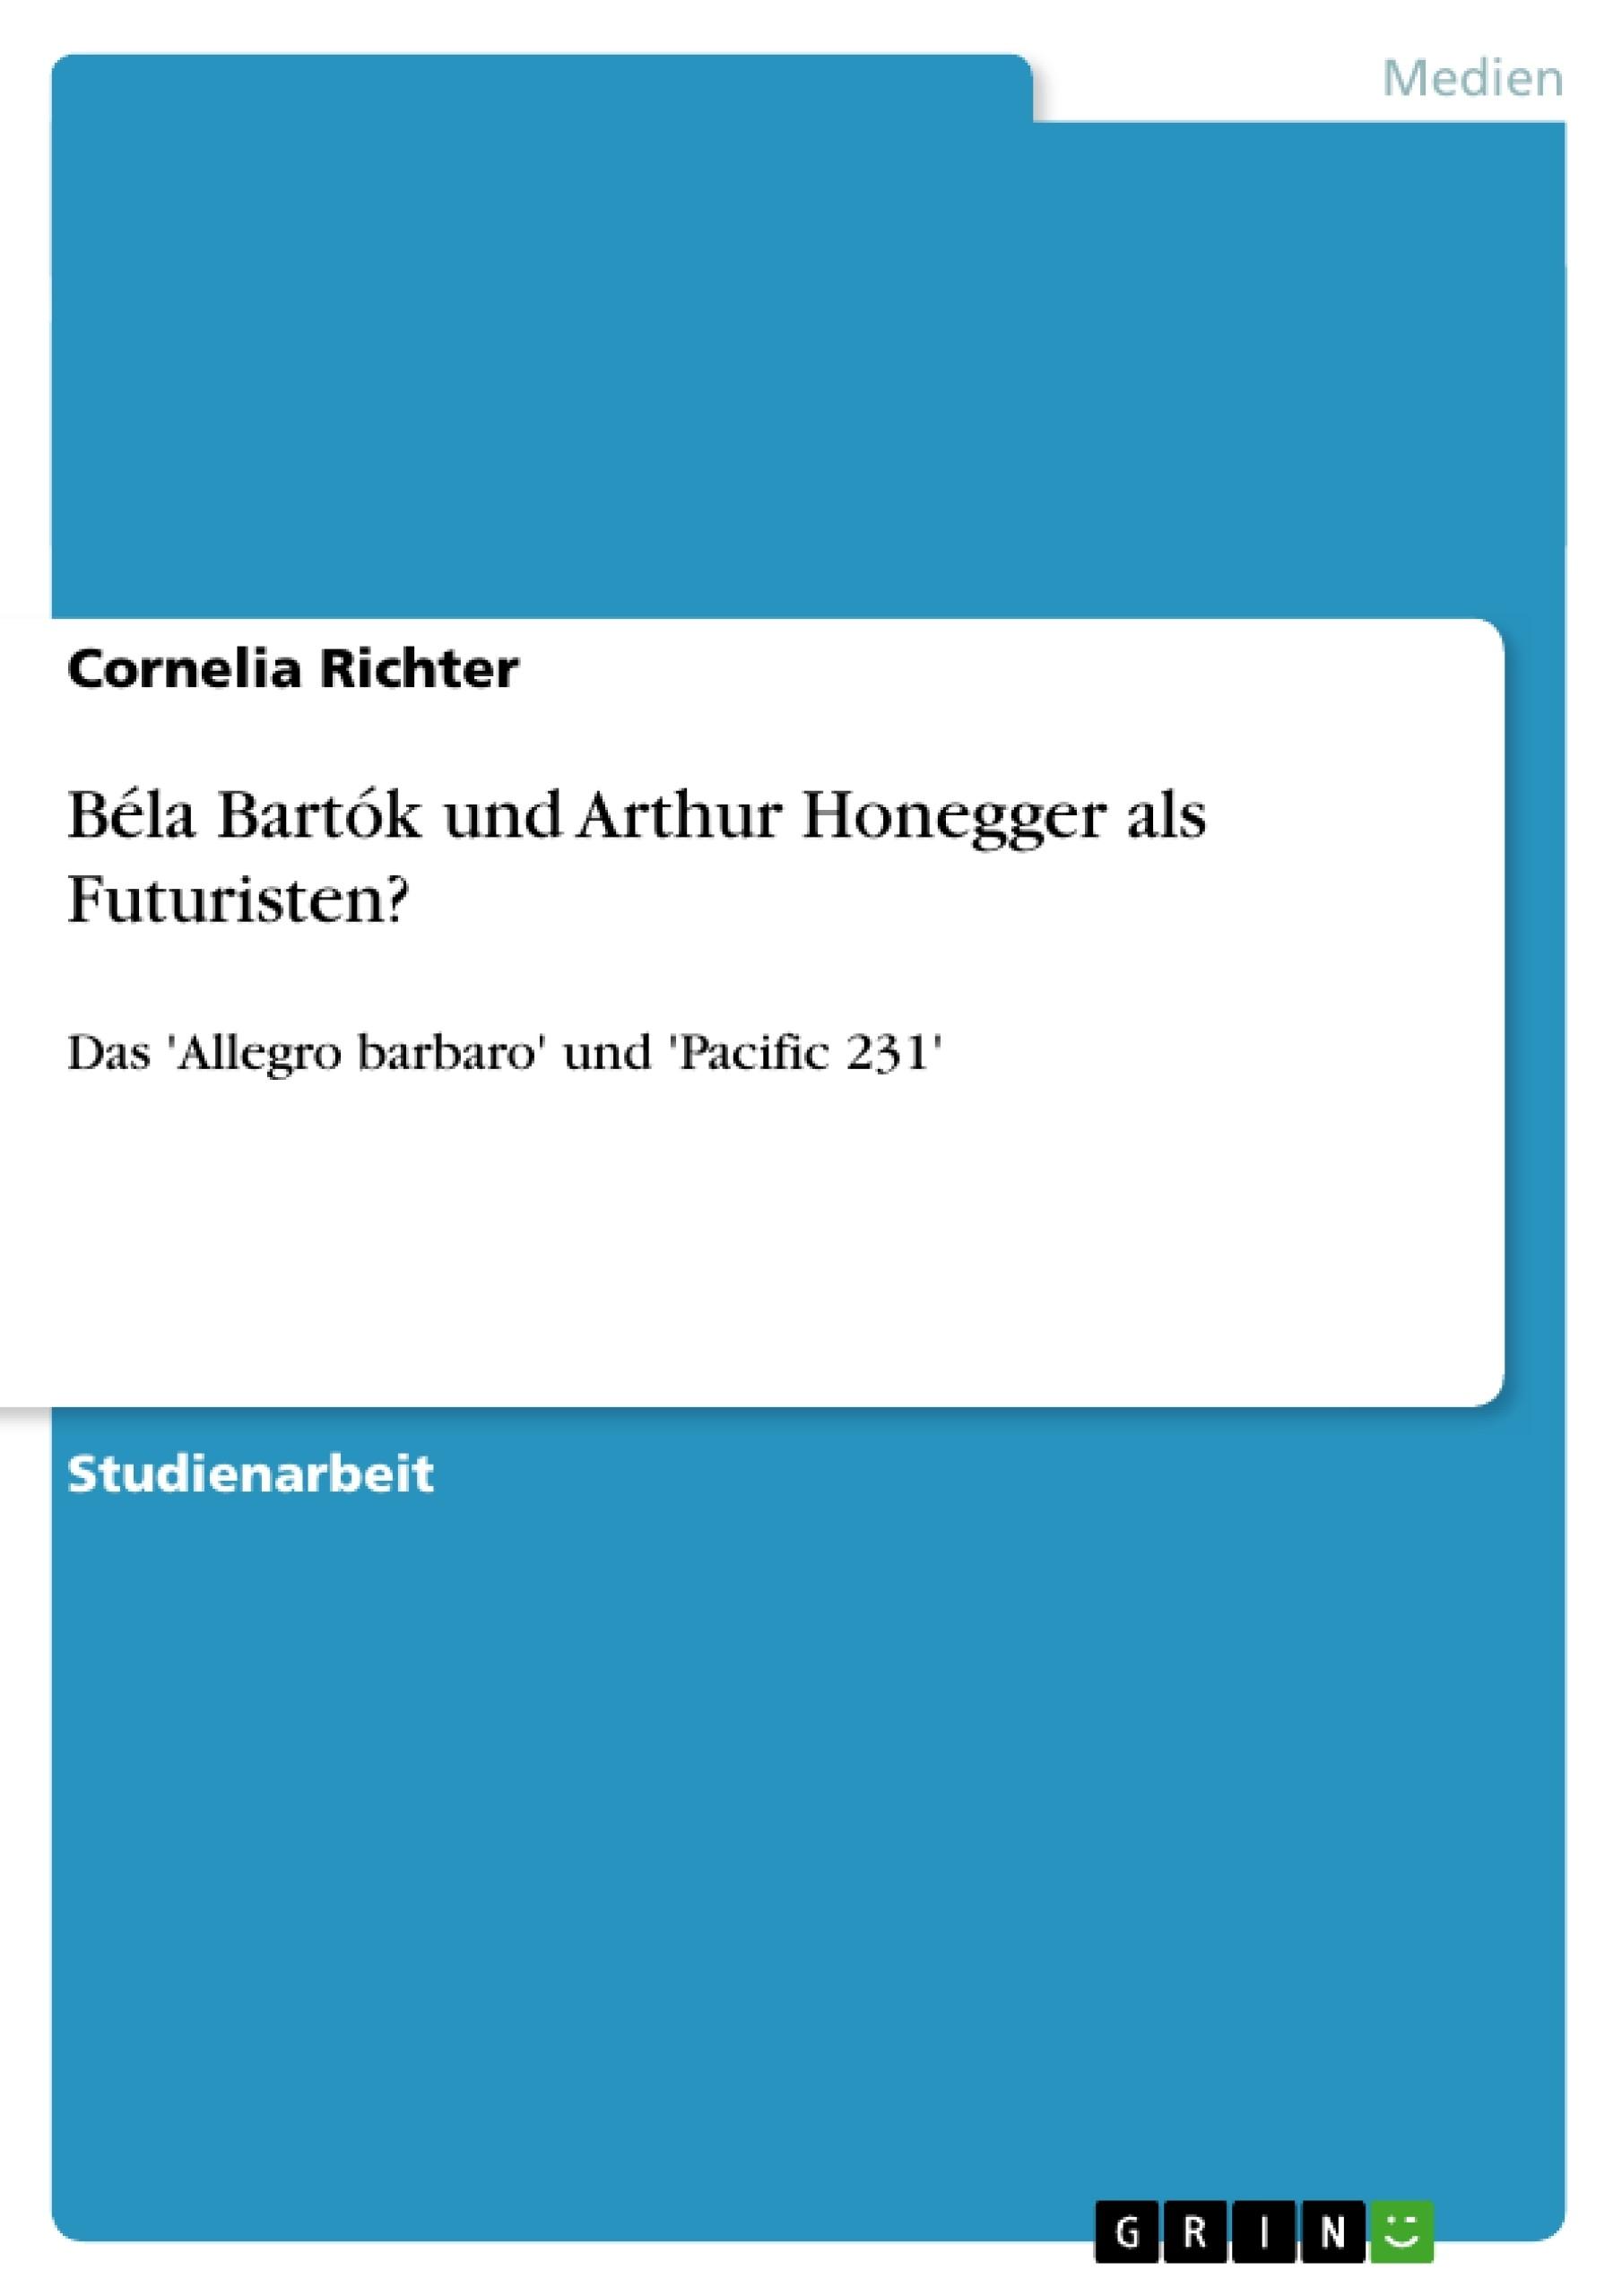 Titel: Béla Bartók und Arthur Honegger als Futuristen?